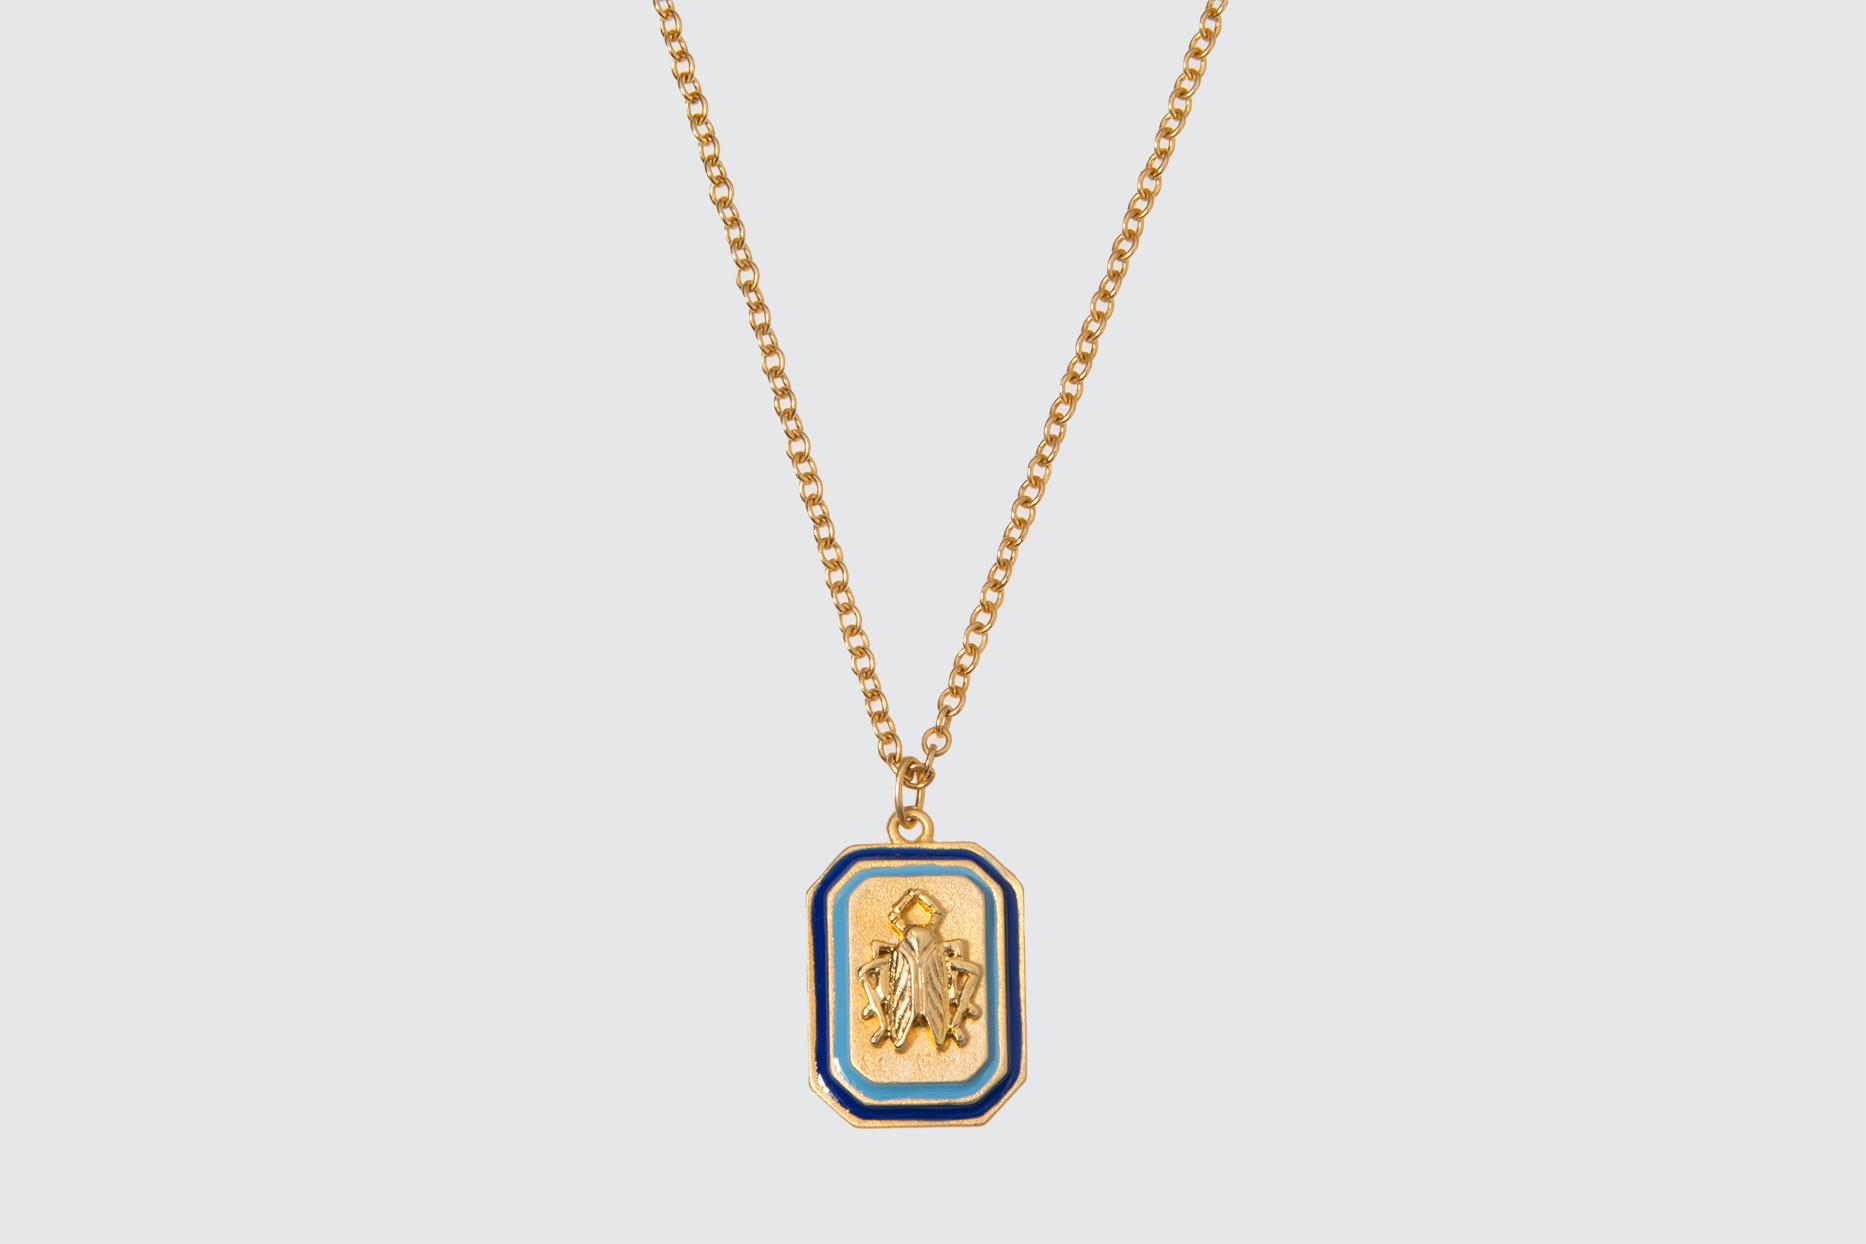 croghans jewel box necklace